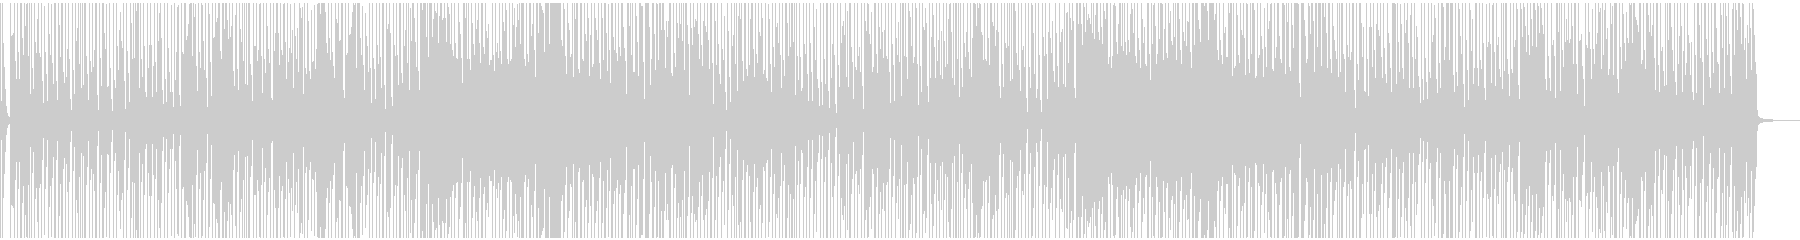 Joyful and light reggae's unreproduced waveform